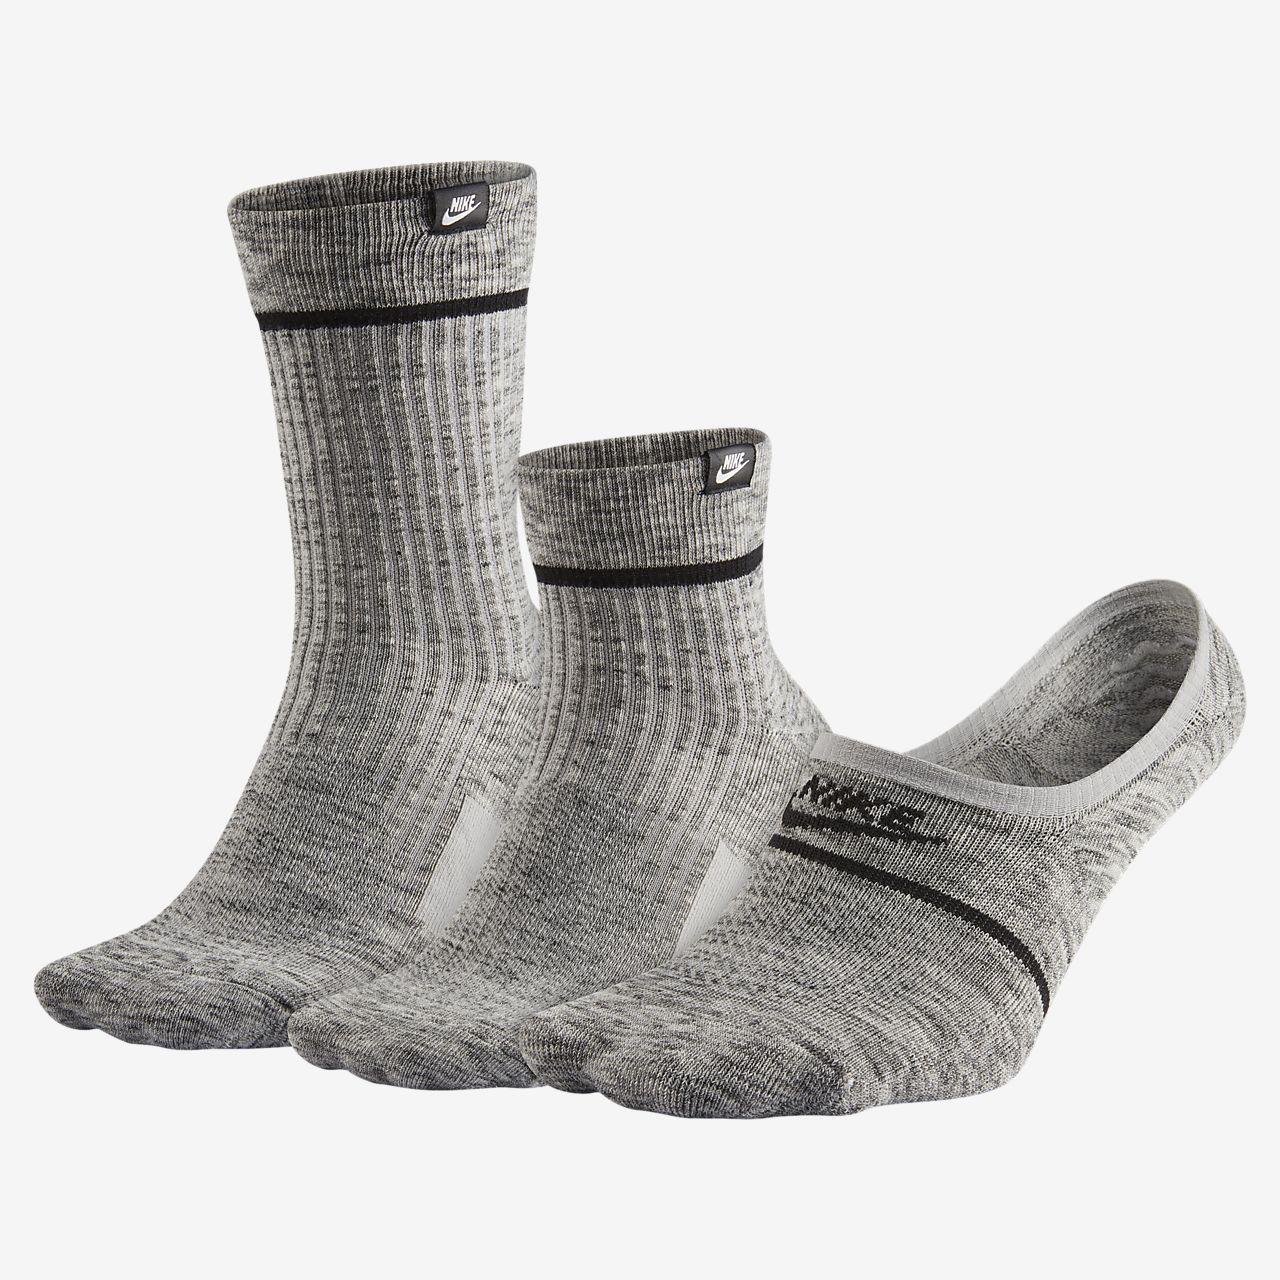 Nike Sneaker Socks Gift Box Set (3 Pairs)